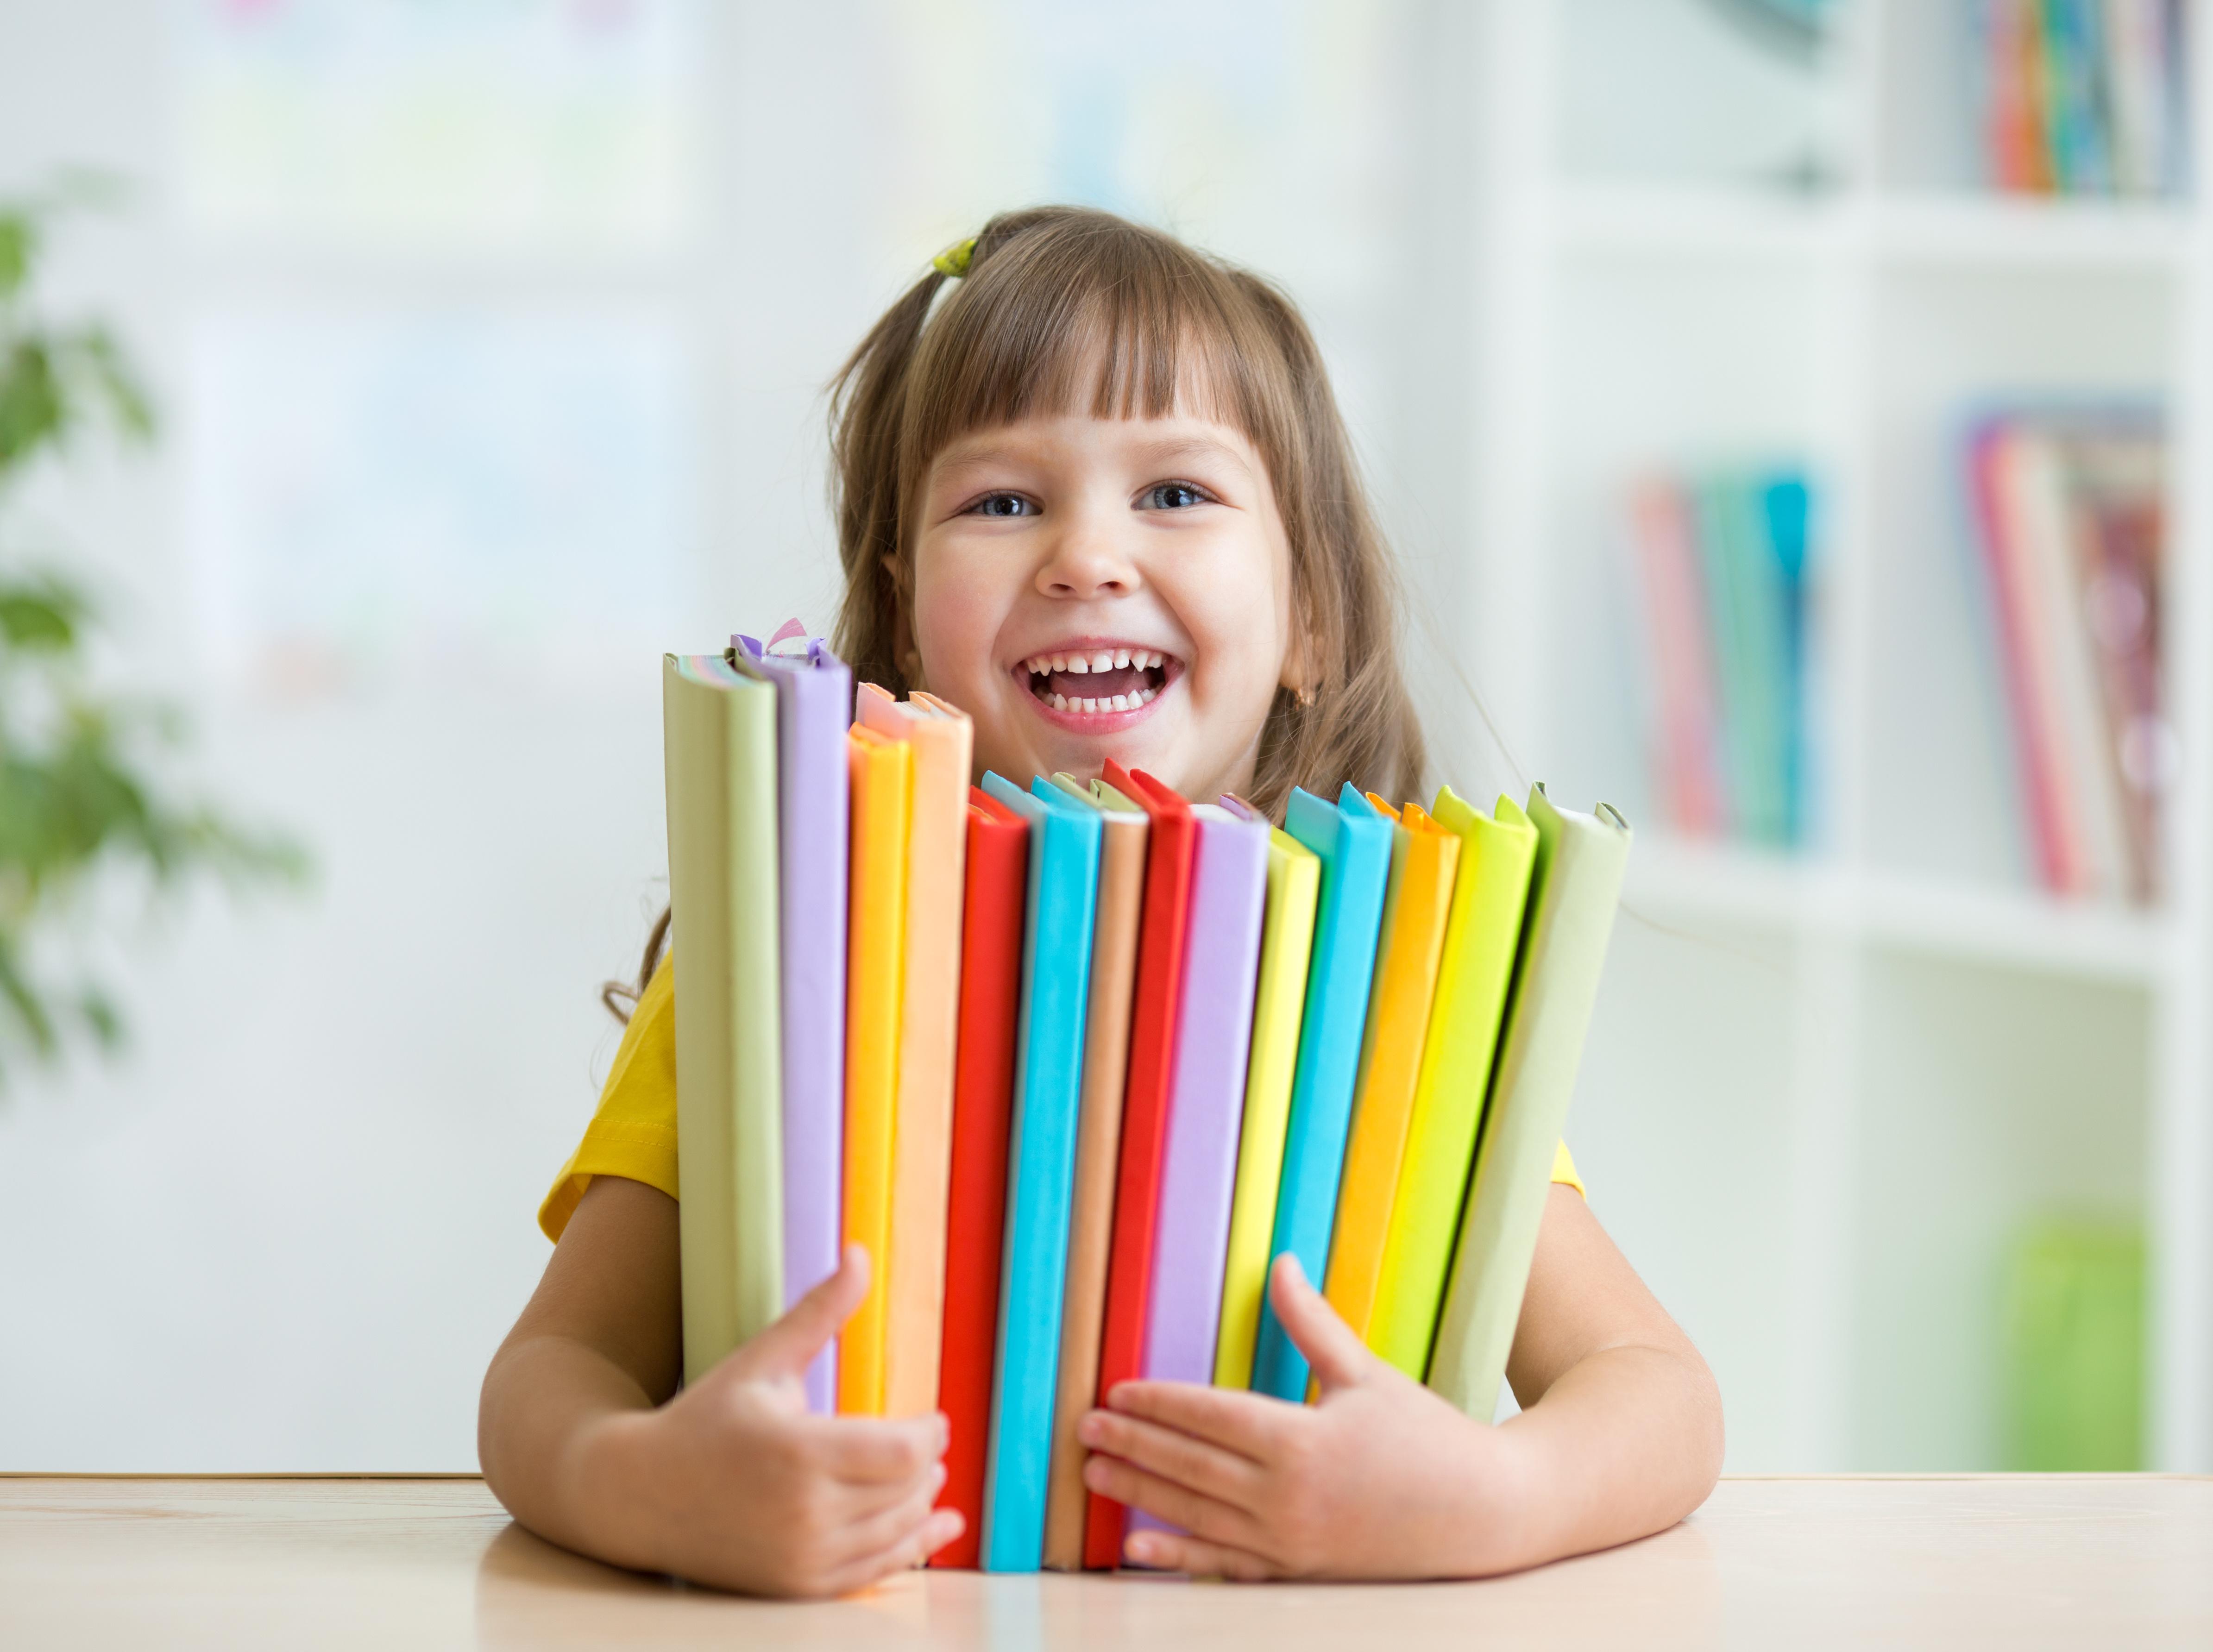 Niña con libros en sus manos